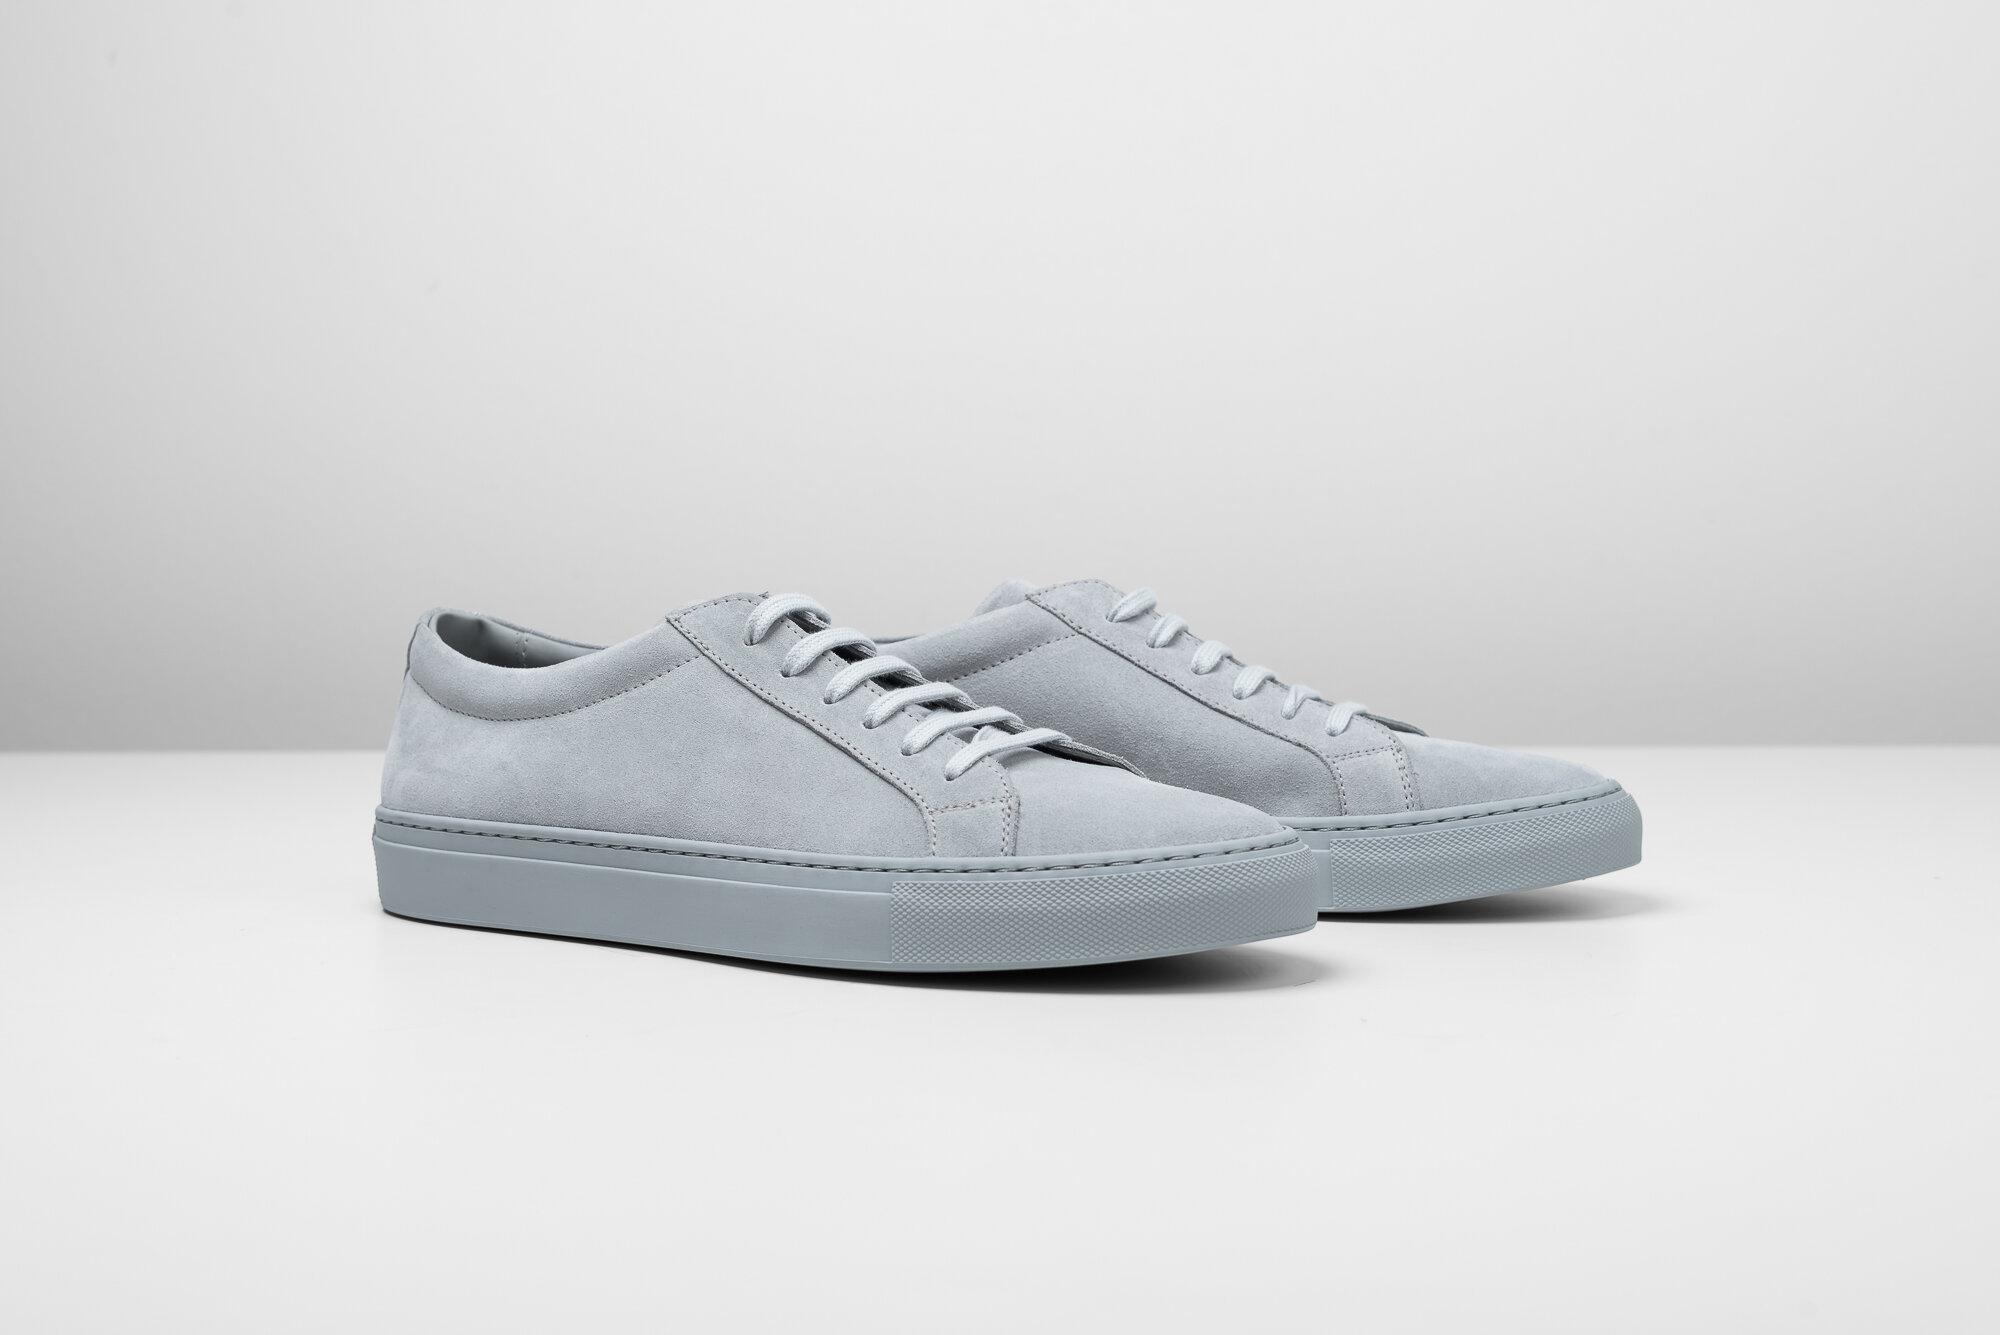 Essential Sneakers - Light Grey Suede